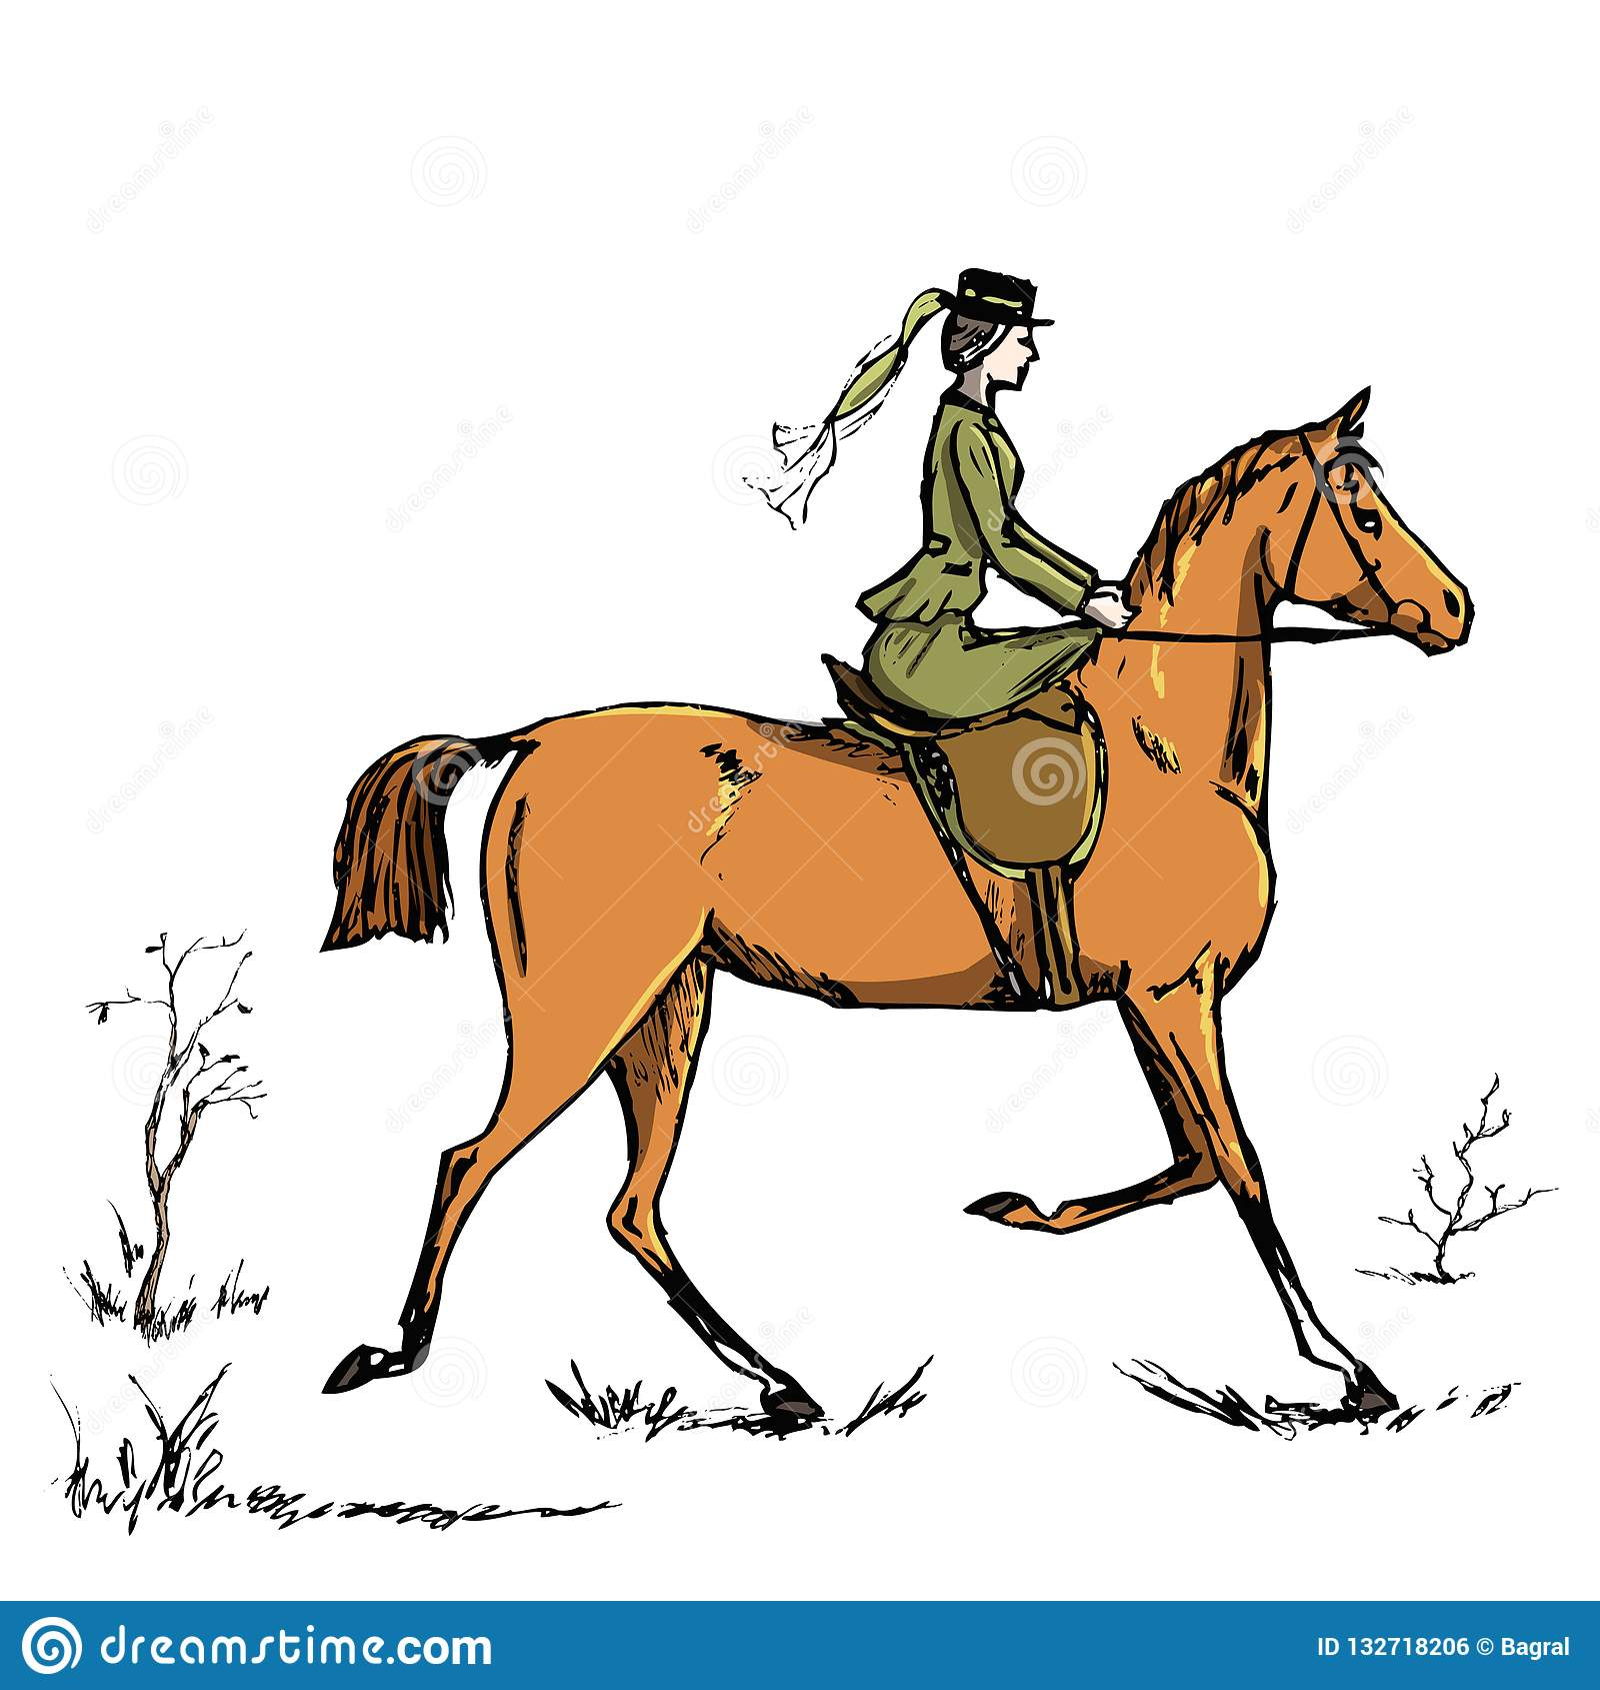 Horsewoman Horse Rider English Style Historic Horseback Lady Riding Habit Woman On Red Horse Stock Illustration Illustration Of Rider Hand 132718206